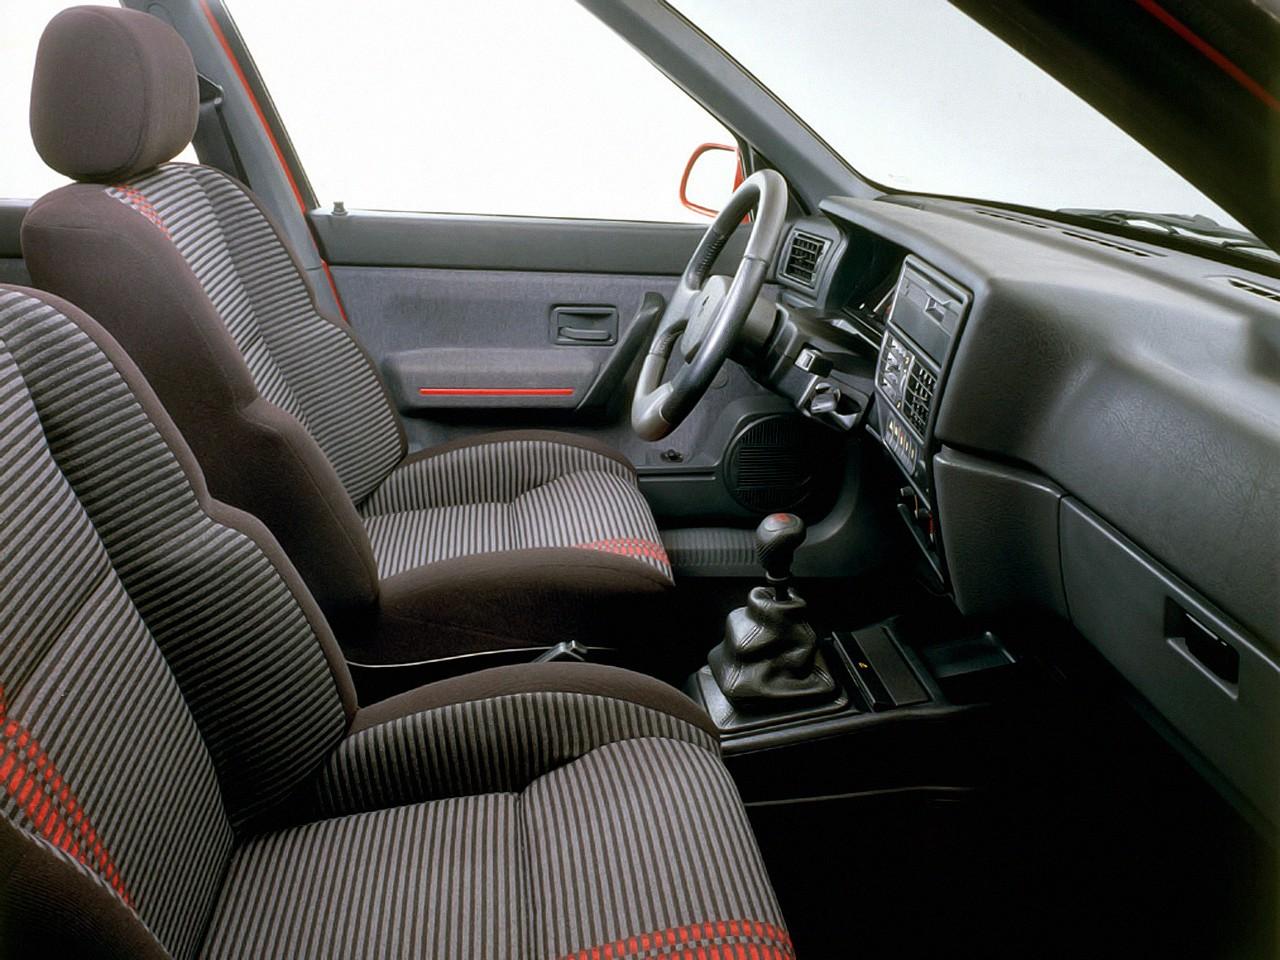 renault 19 3 doors specs 1988 1989 1990 1991 1992 autoevolution. Black Bedroom Furniture Sets. Home Design Ideas